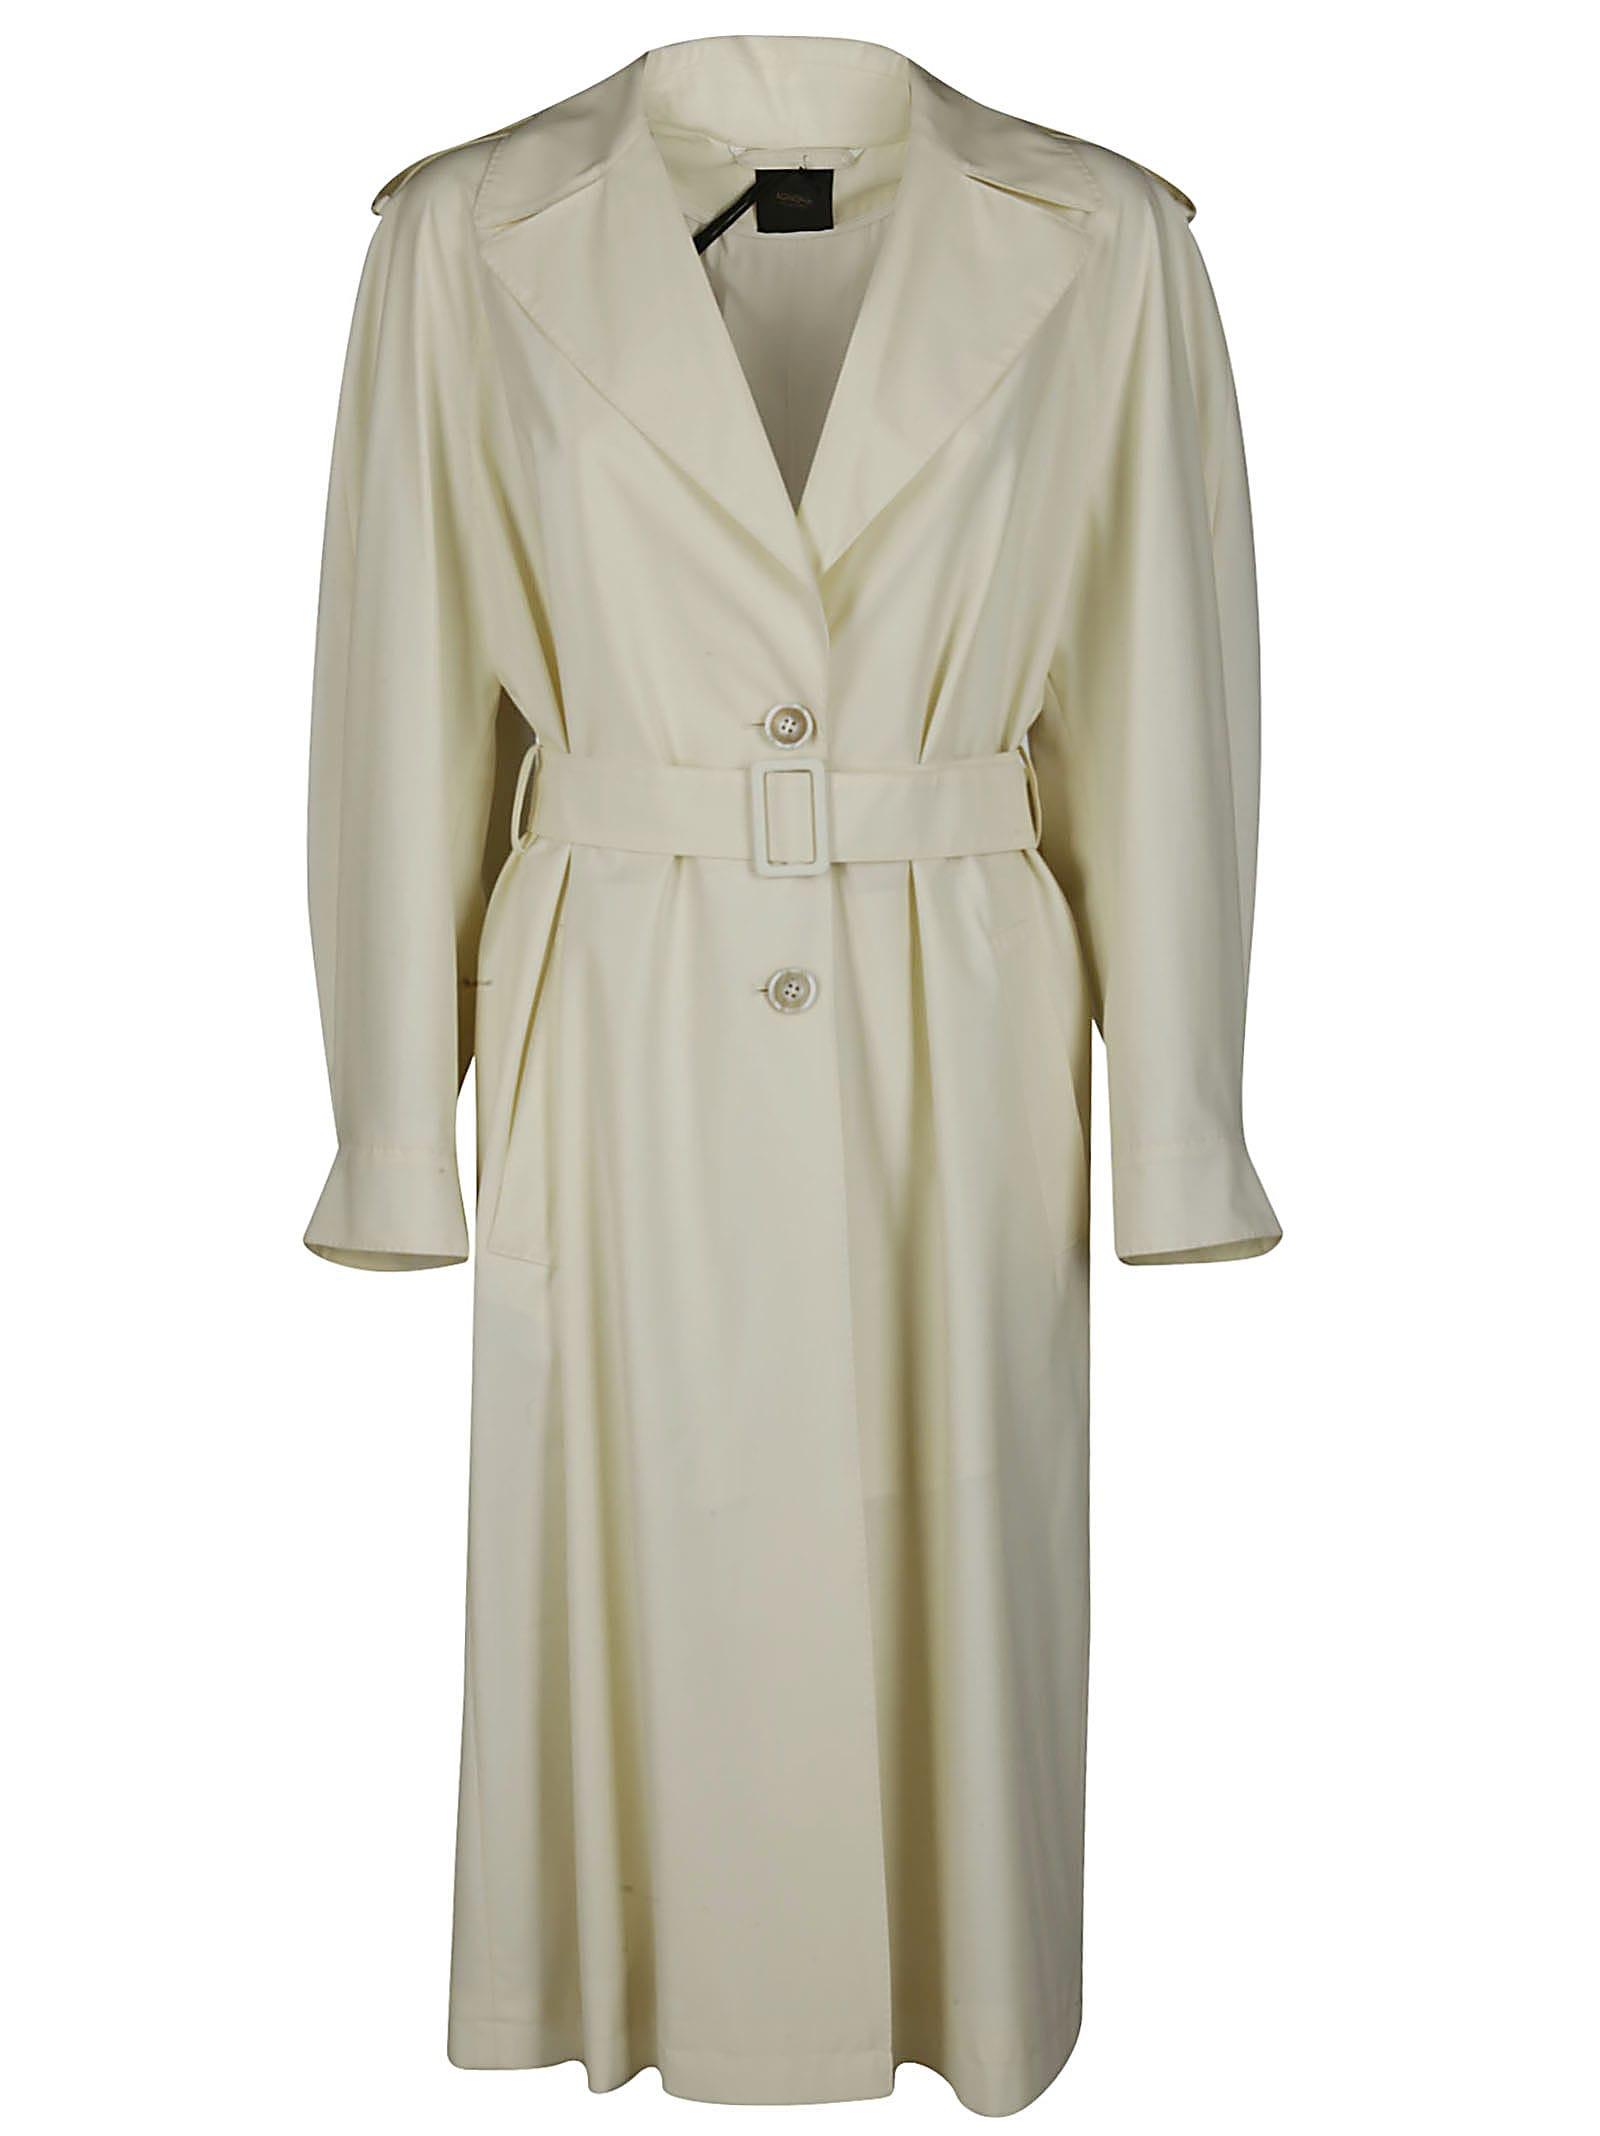 Agnona White Wool Eternals Trench Coat In Cream